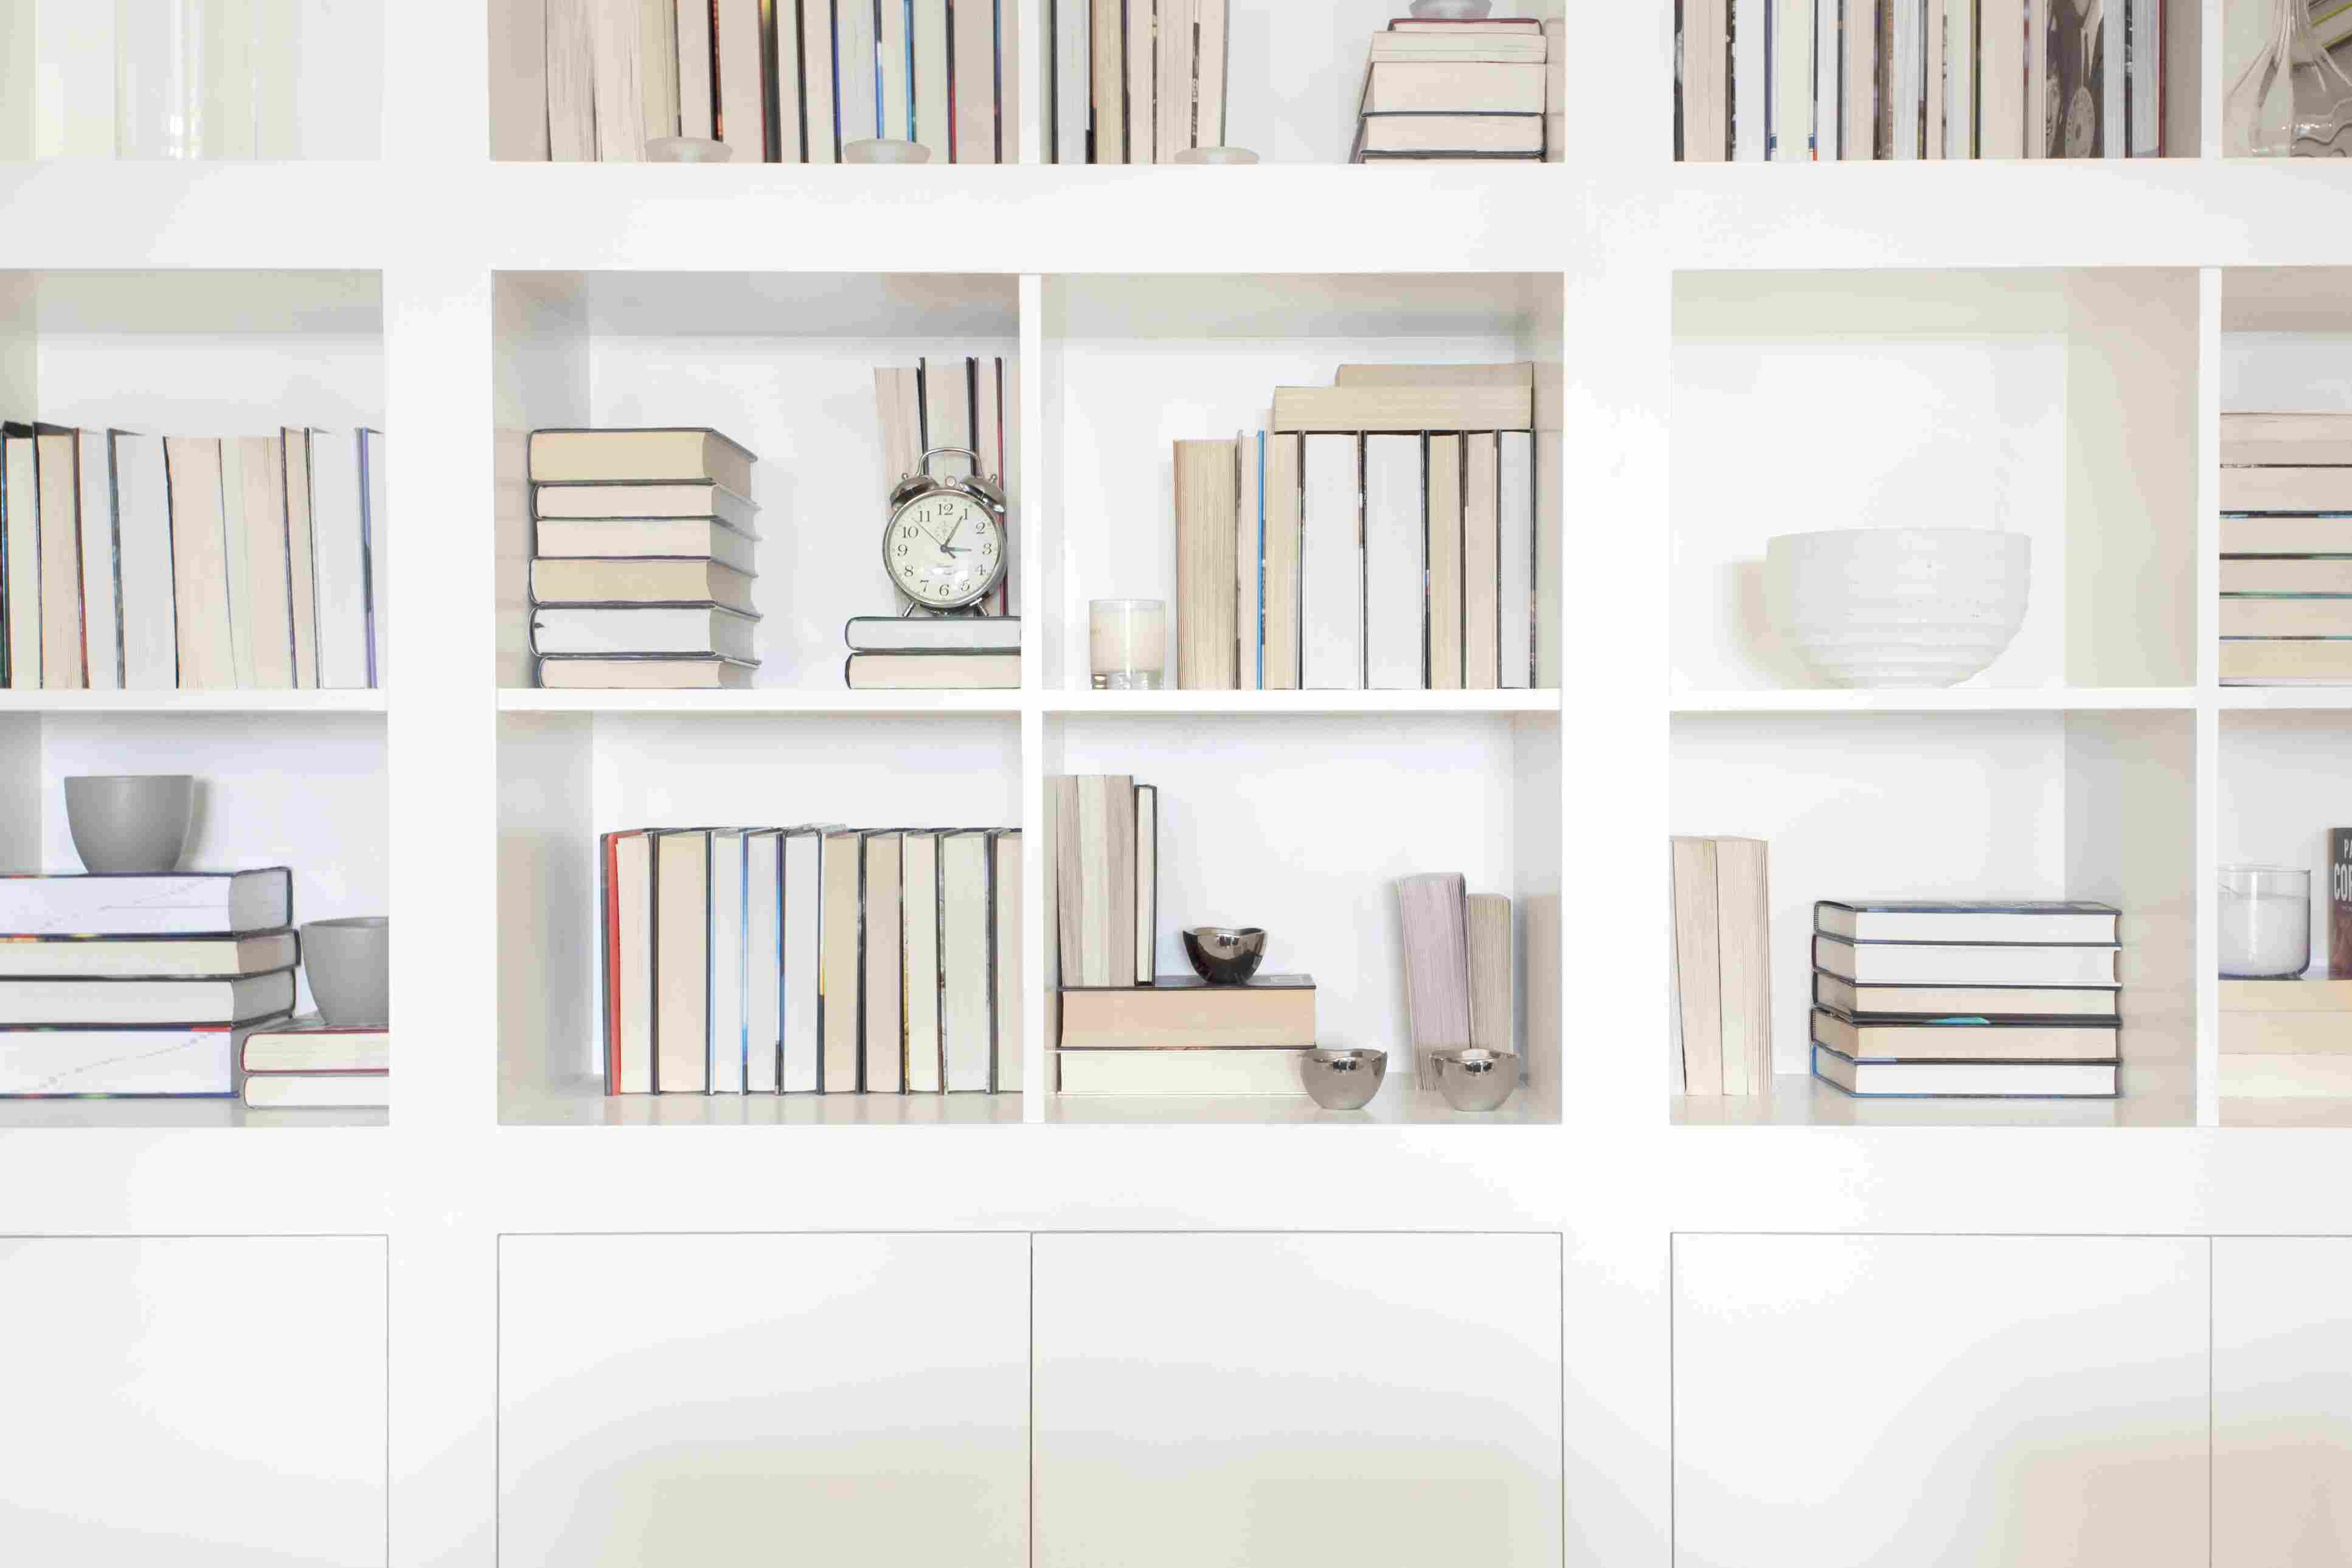 Bookshelf display